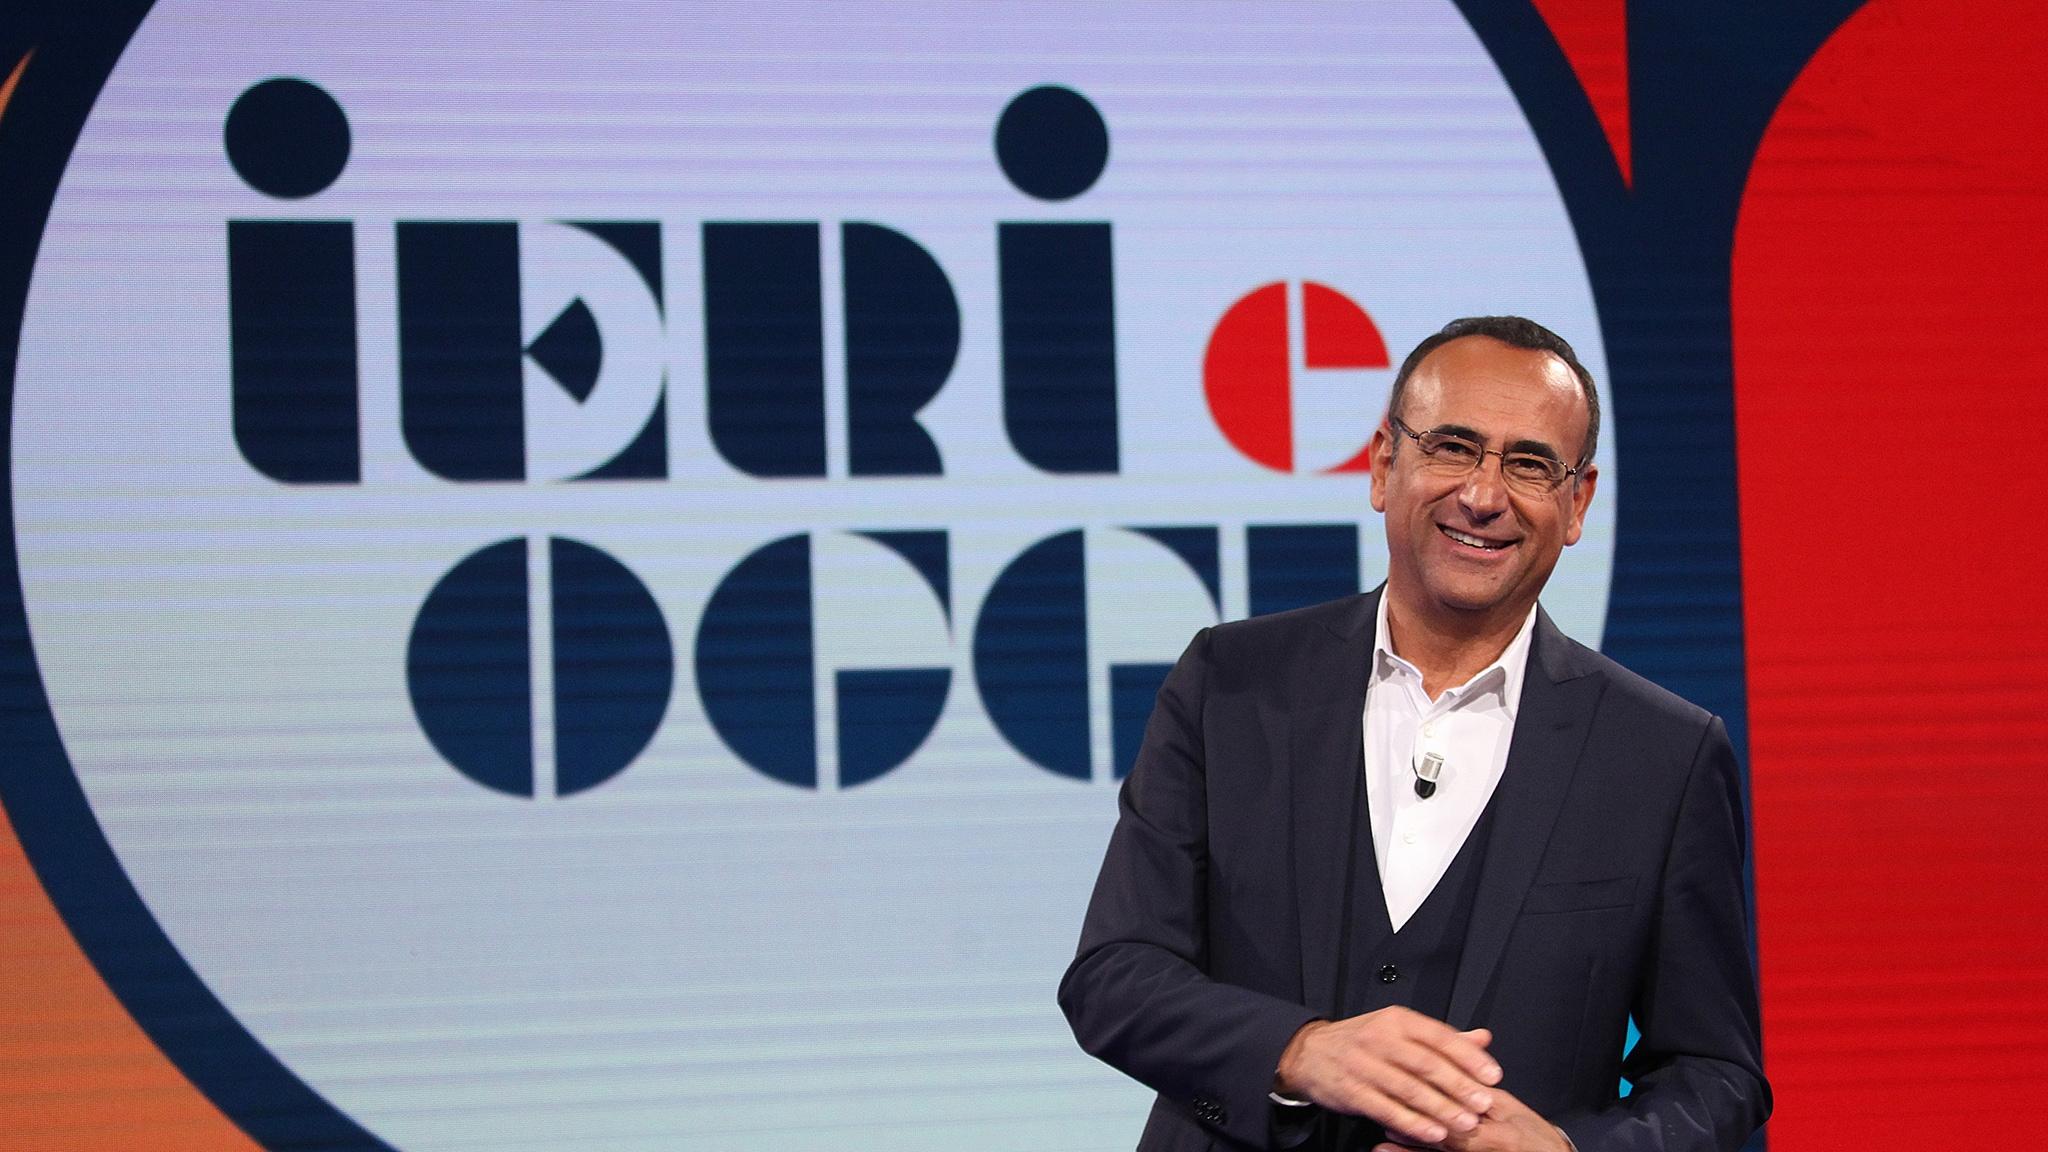 Rai Premium Ieri e Oggi - Nino Frassica e Fausto Leali